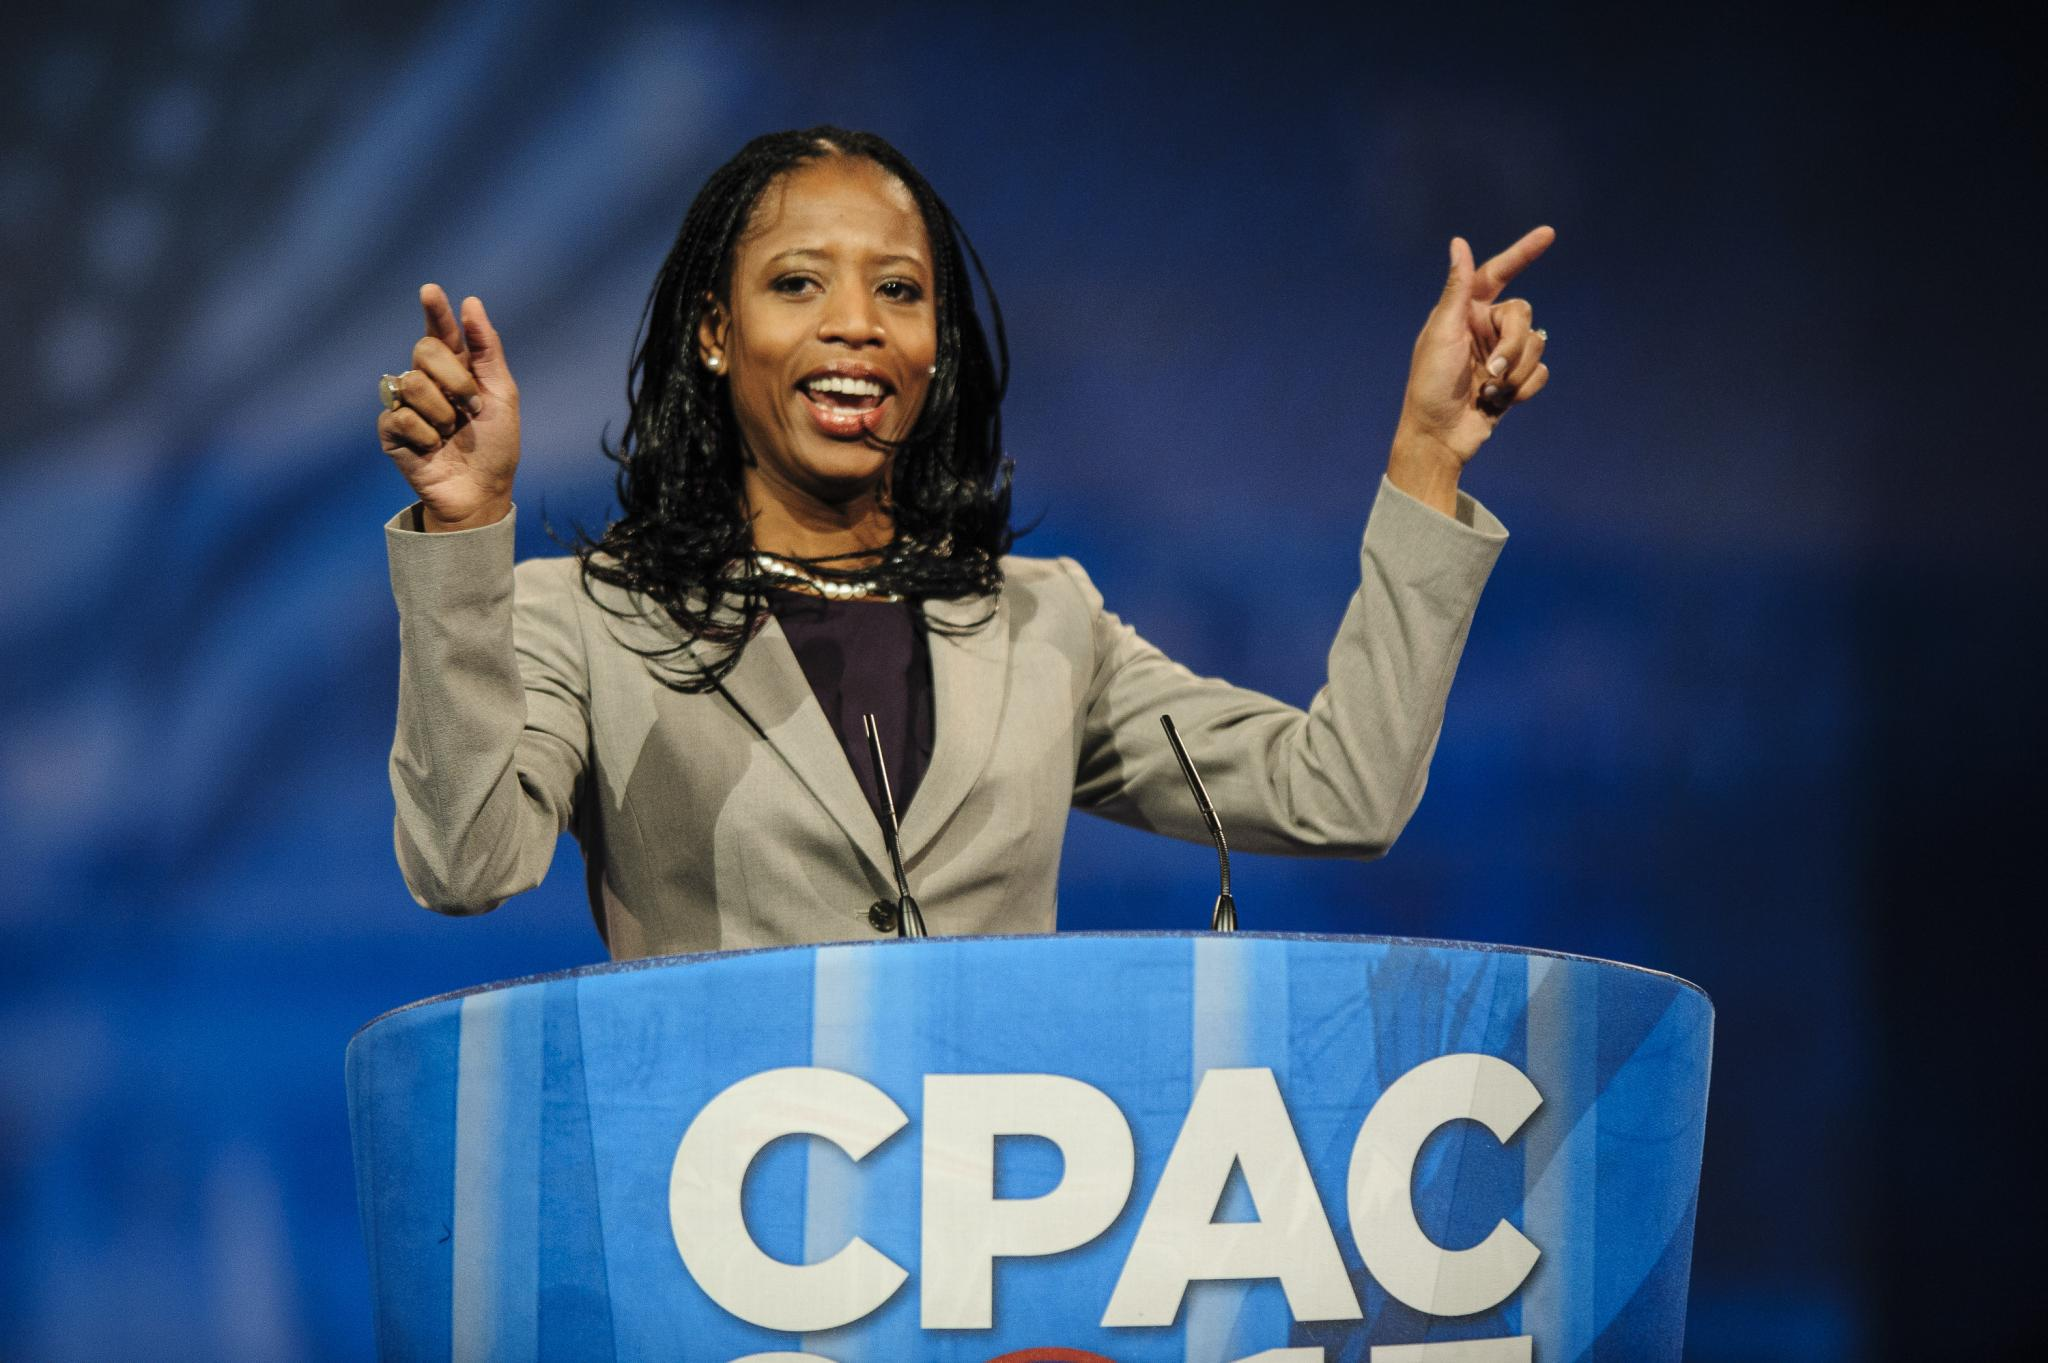 Mia Love Becomes First Black Woman Republican in Congress